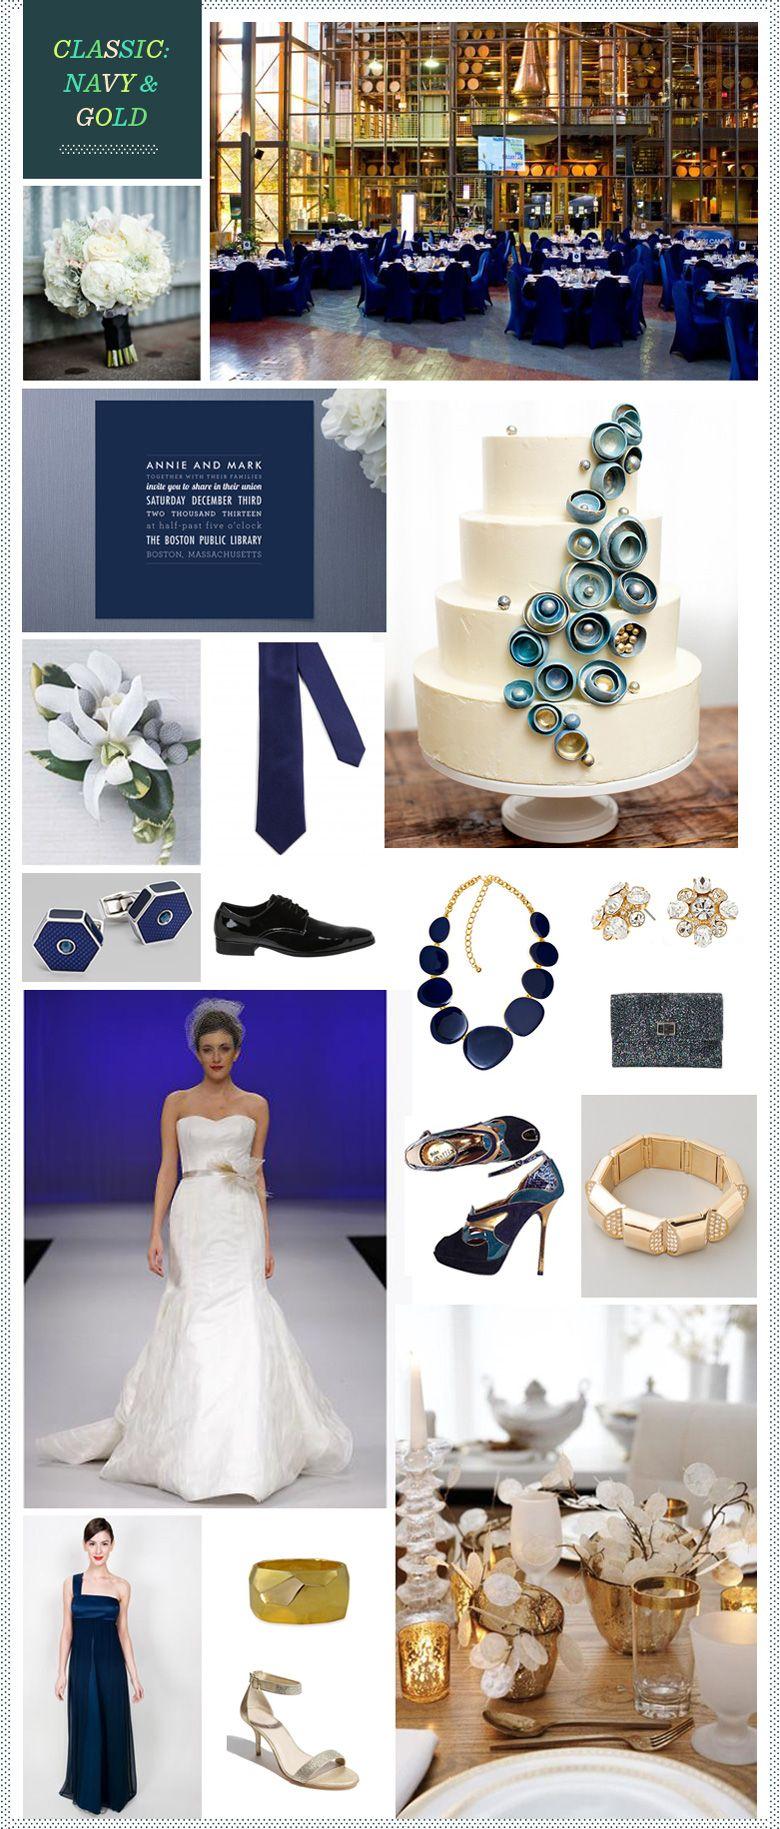 Navy wedding casamento pinterest navy wedding and wedding navy